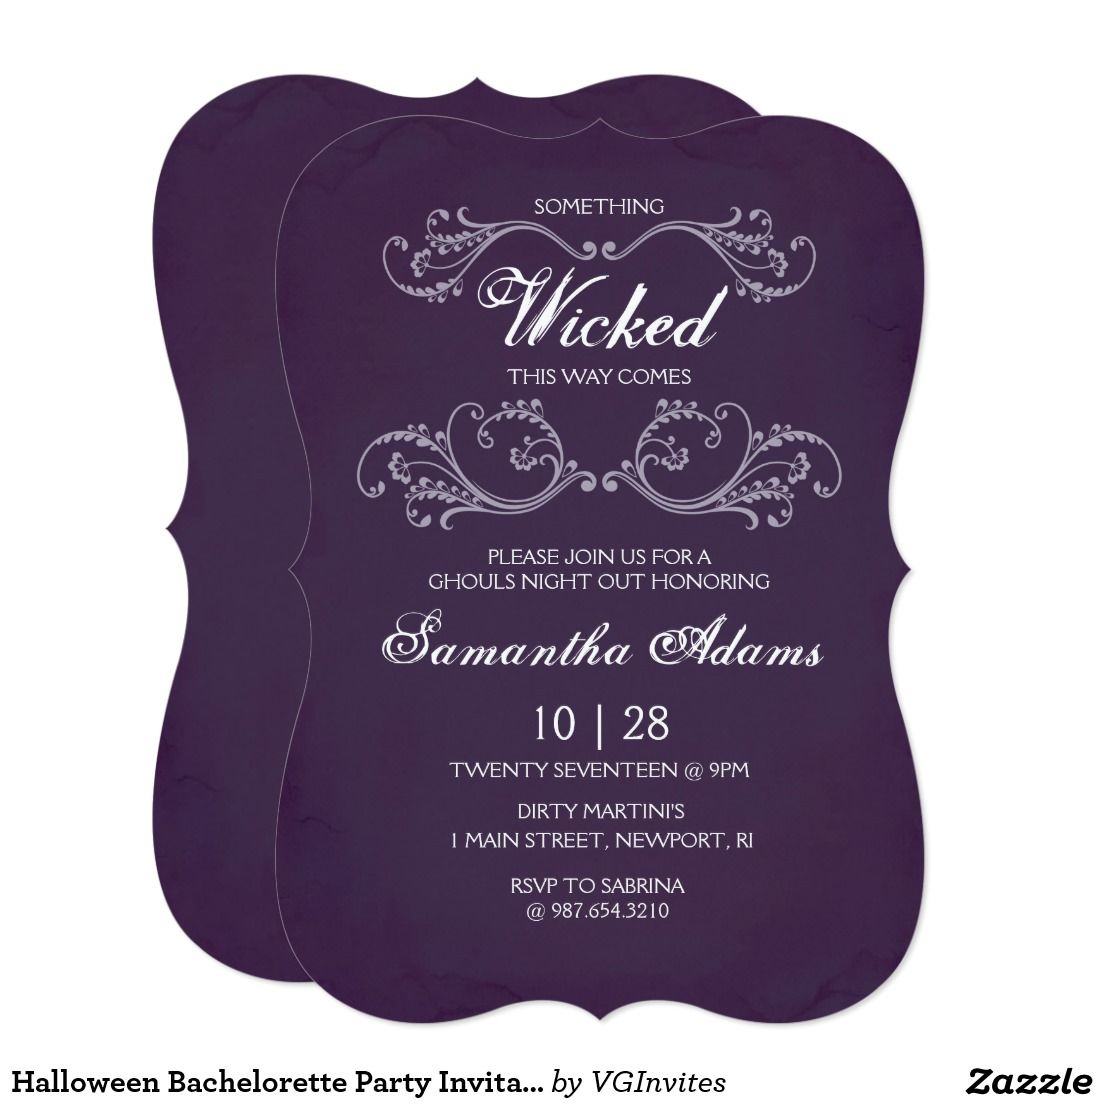 Halloween Bachelorette Party Invitation - Purple   Boo! Halloween ...